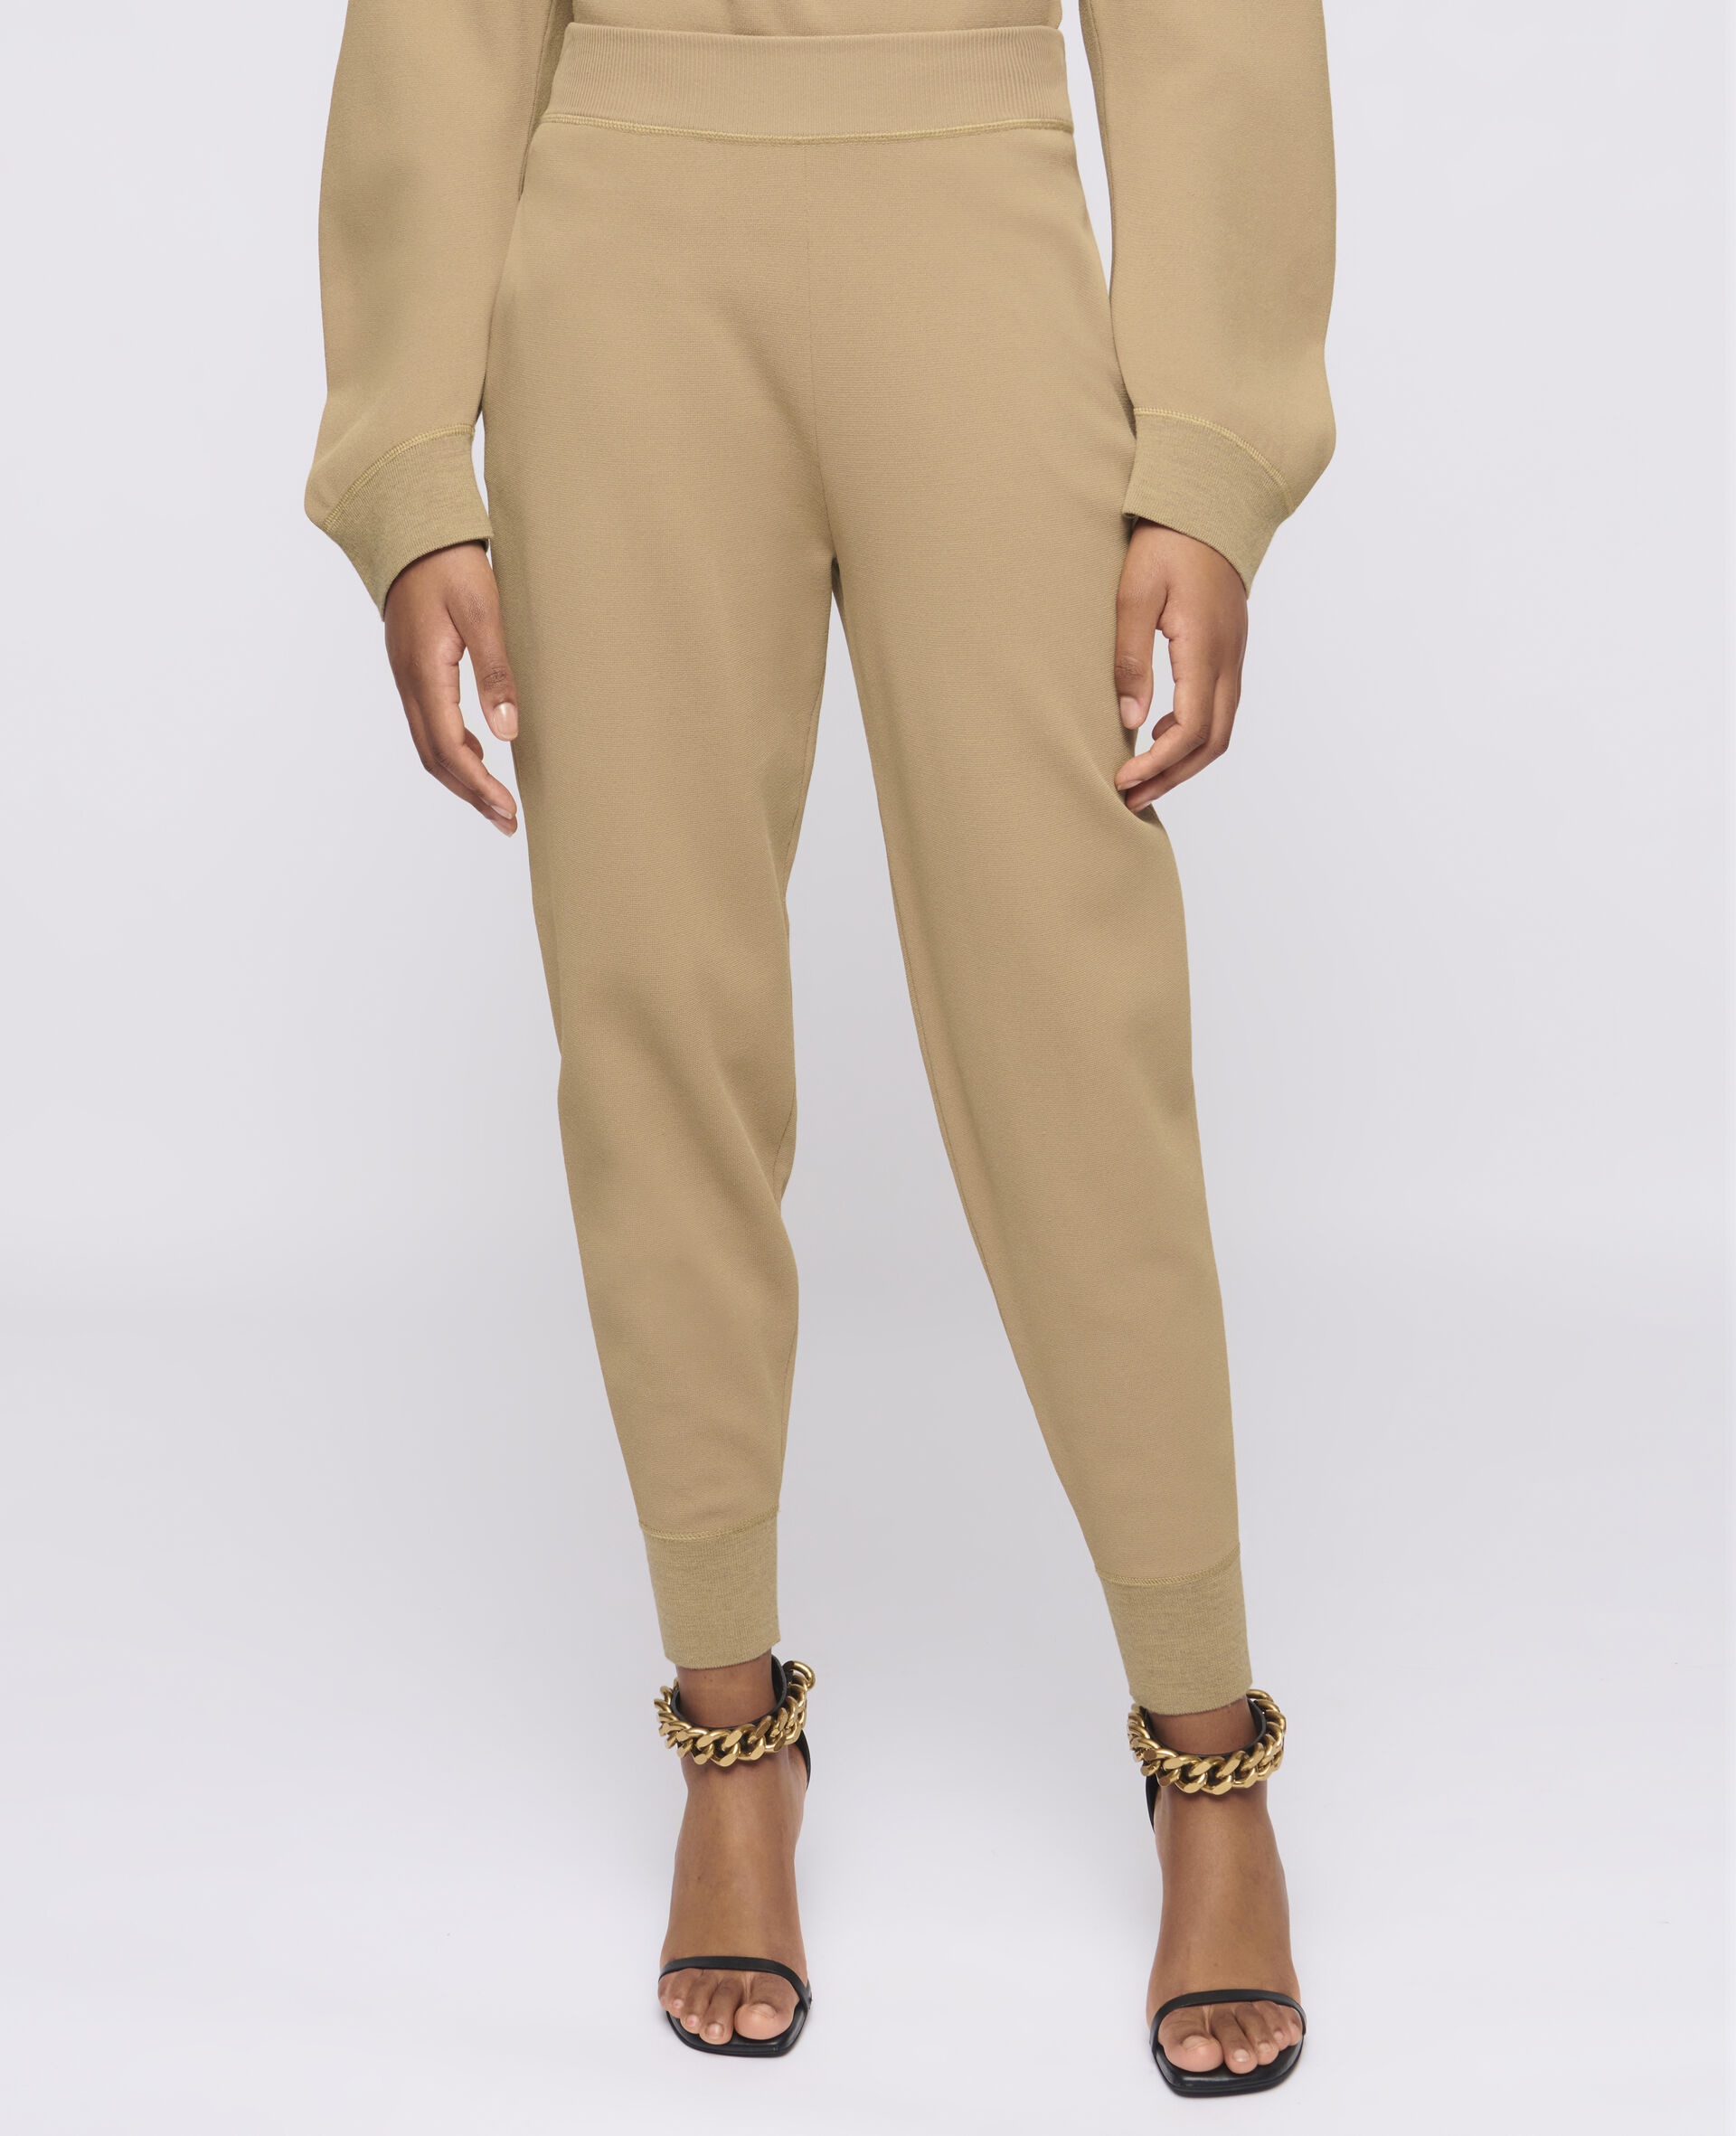 Pantaloni in Maglia Compatta-Marrone-large image number 3